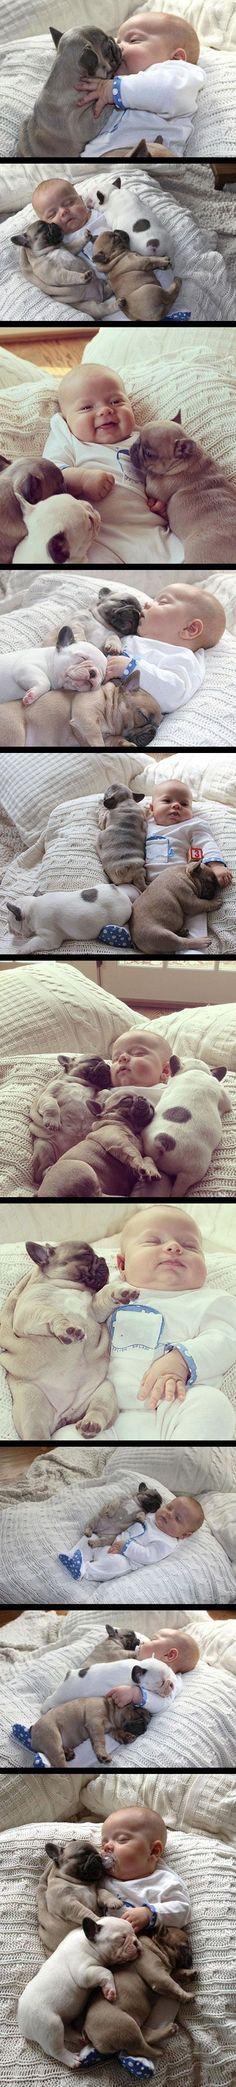 baby with more babies (scheduled via http://www.tailwindapp.com?utm_source=pinterest&utm_medium=twpin&utm_content=post16018036&utm_campaign=scheduler_attribution)